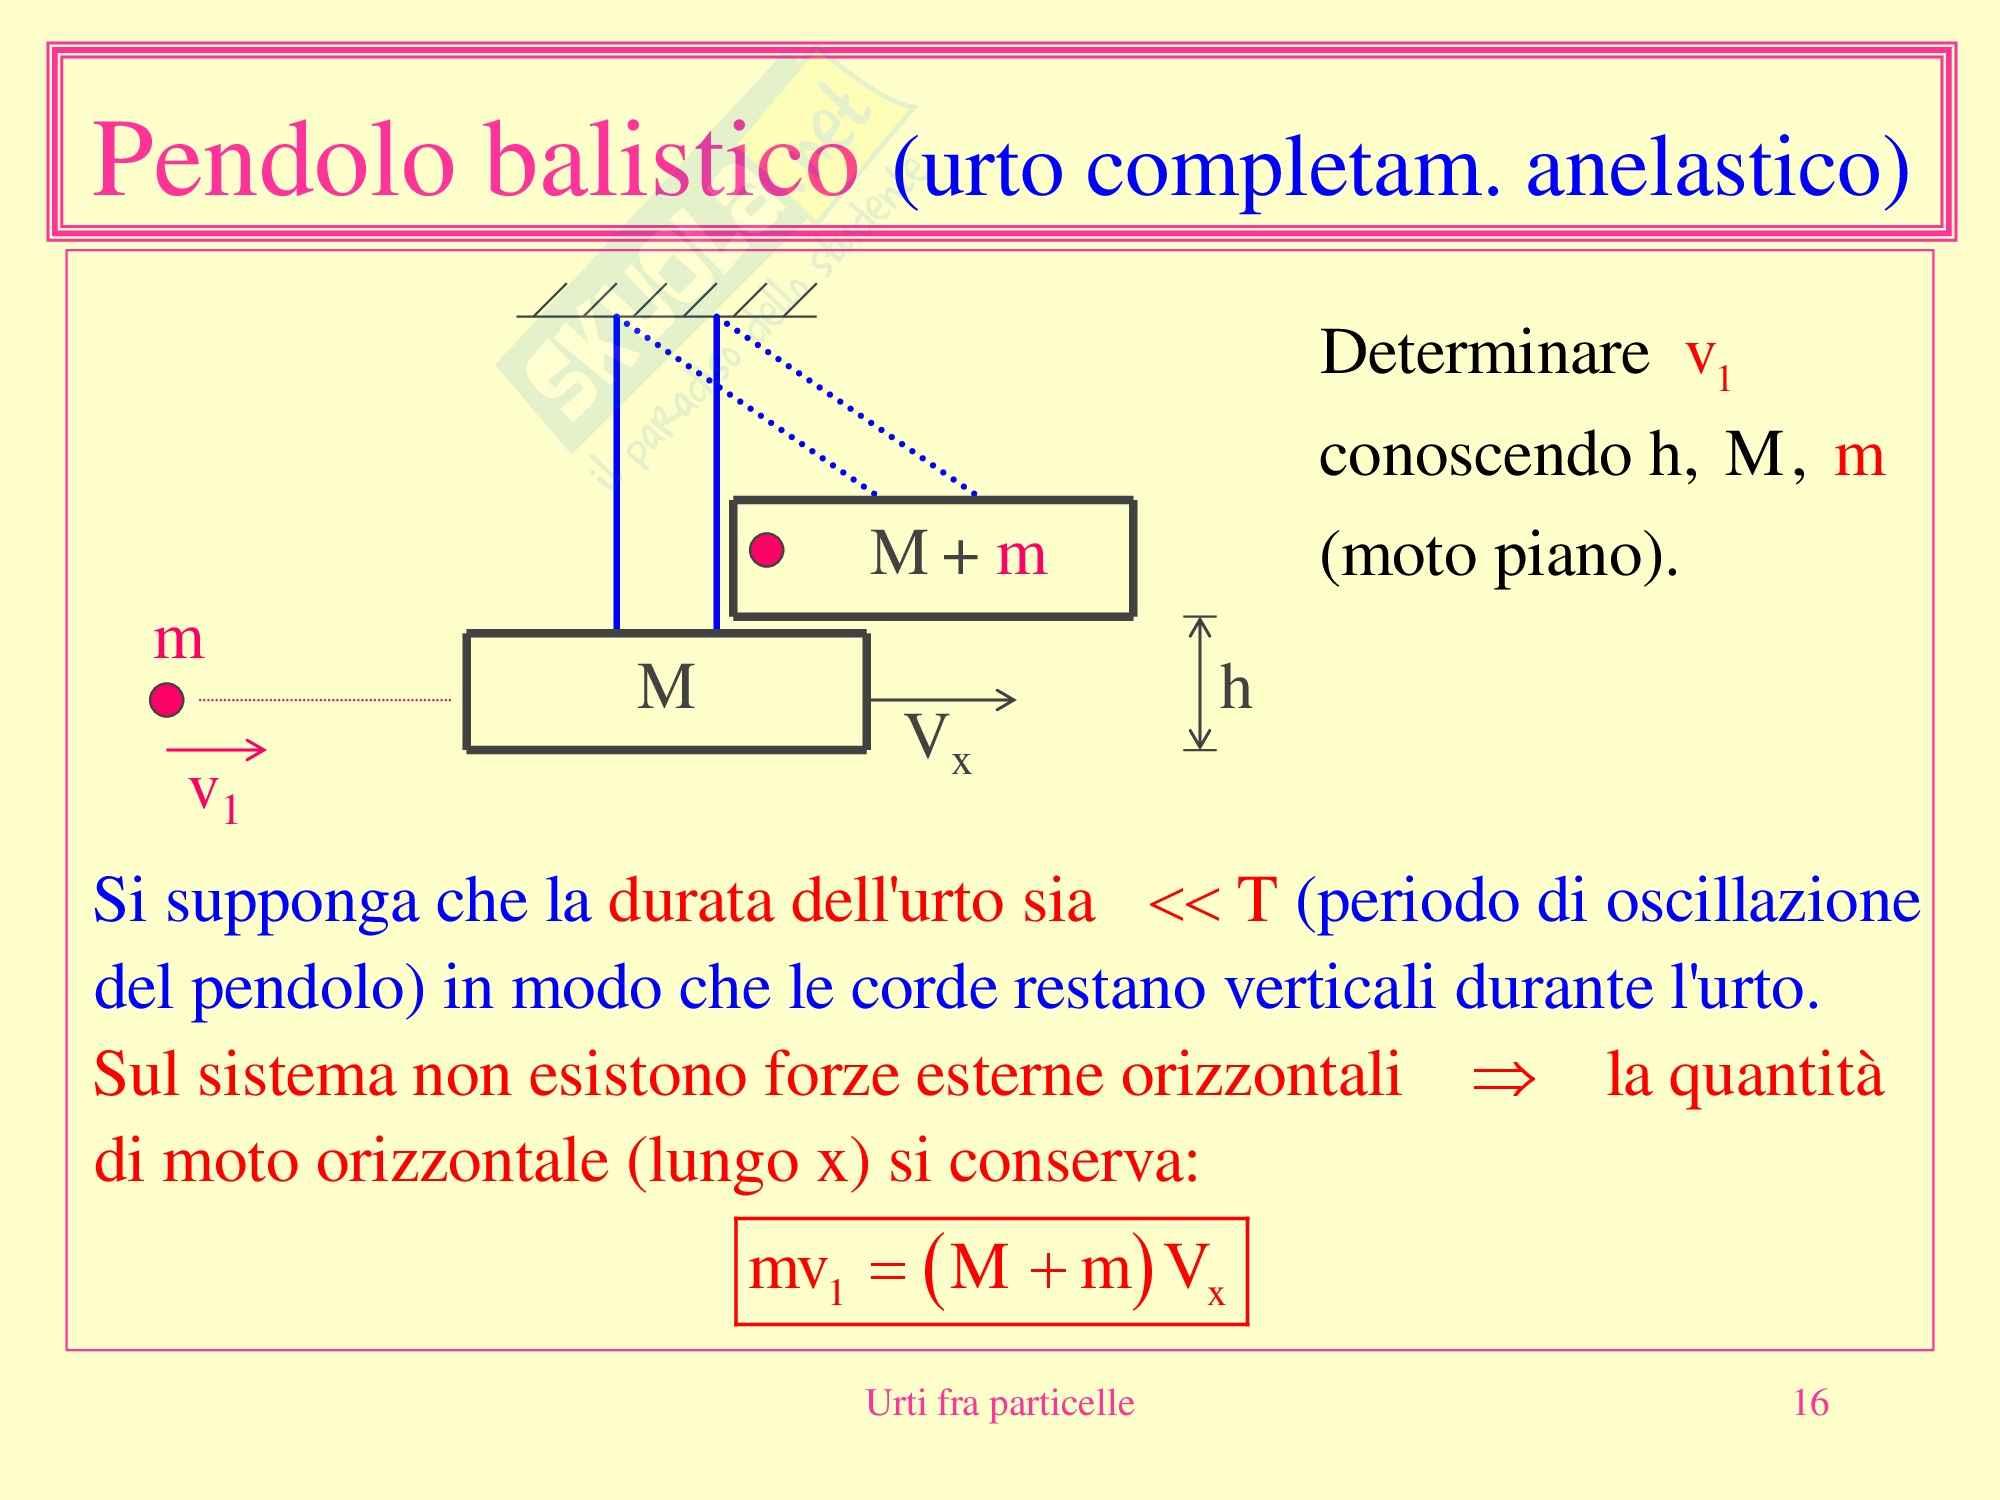 Fisica medica - urti fra particelle Pag. 16